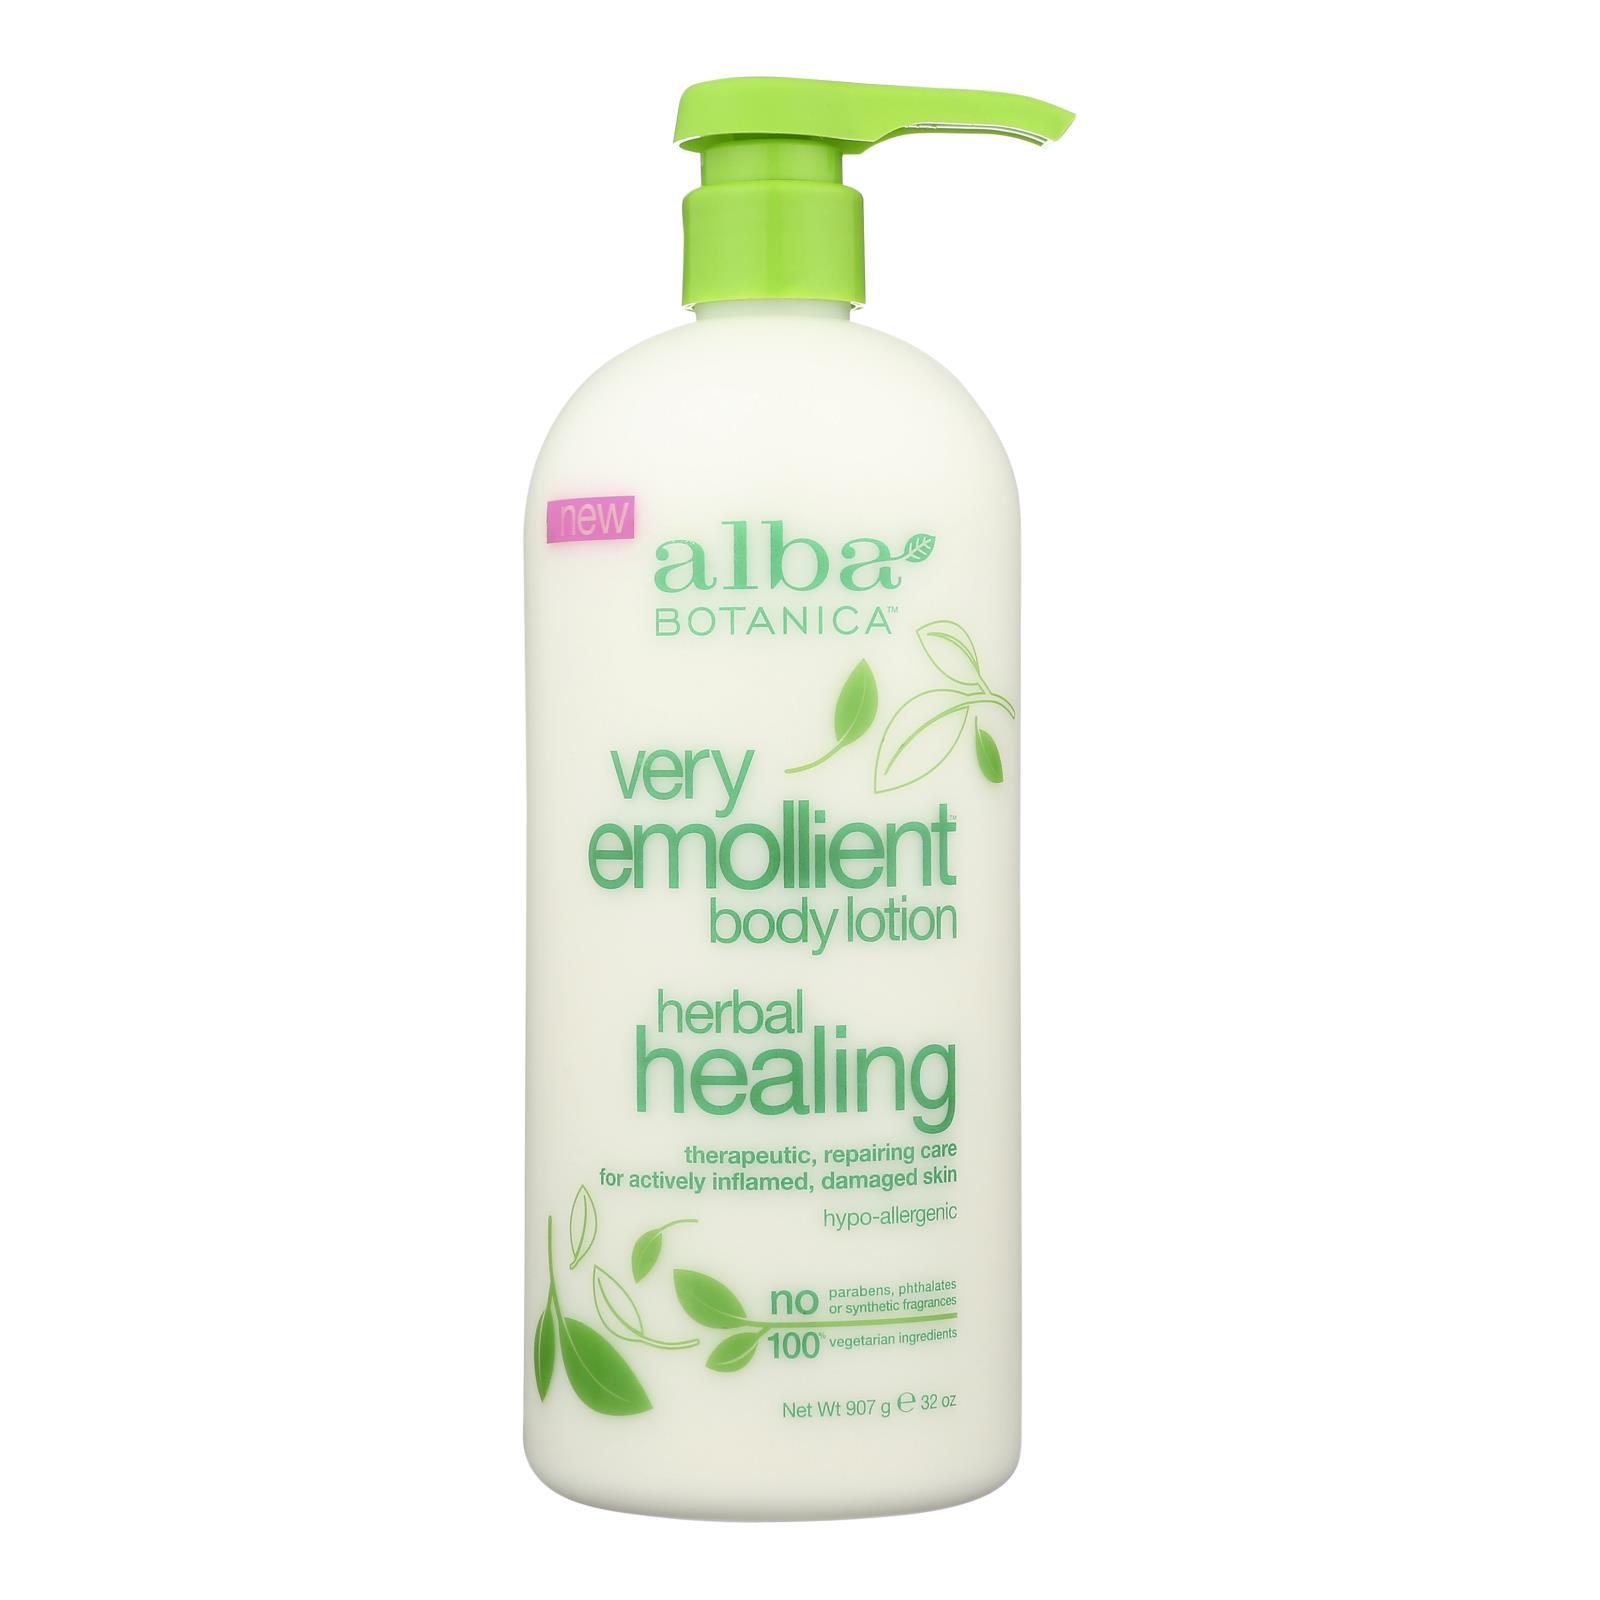 Alba Botanica - Body Lotion - Very Emollient - Herbal - 32 oz